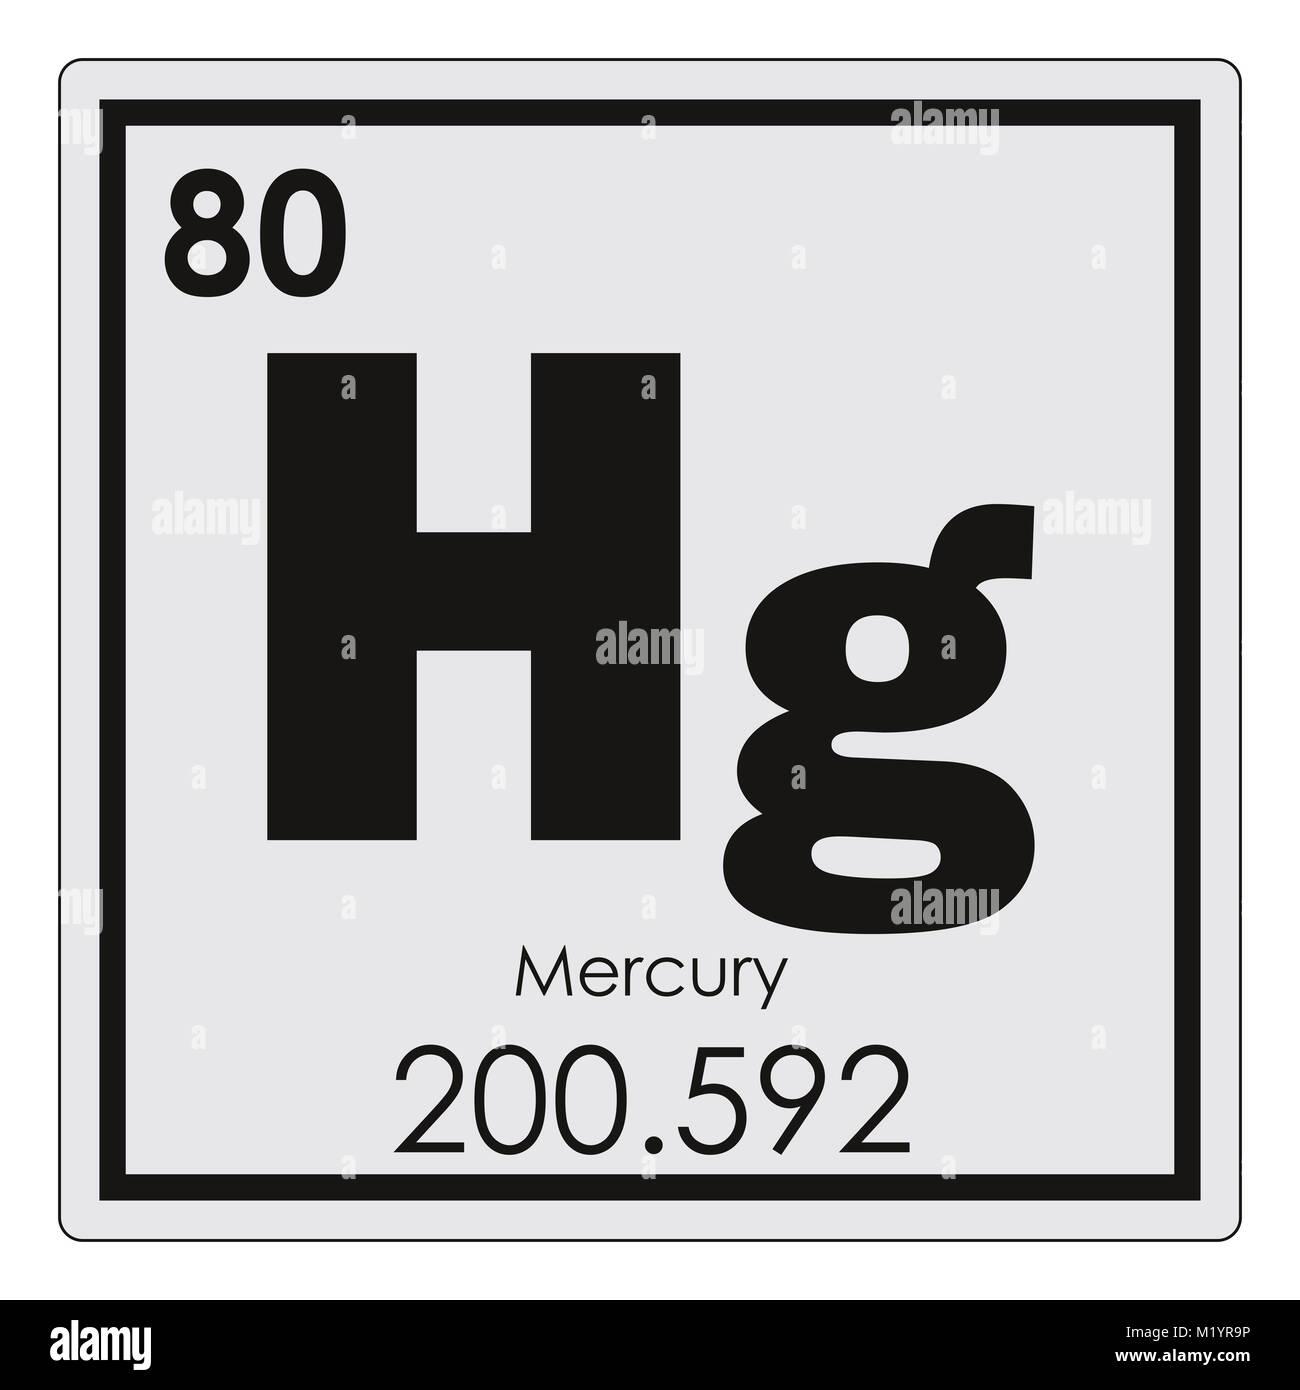 Mercury chemical element periodic table science symbol stock photo mercury chemical element periodic table science symbol urtaz Gallery